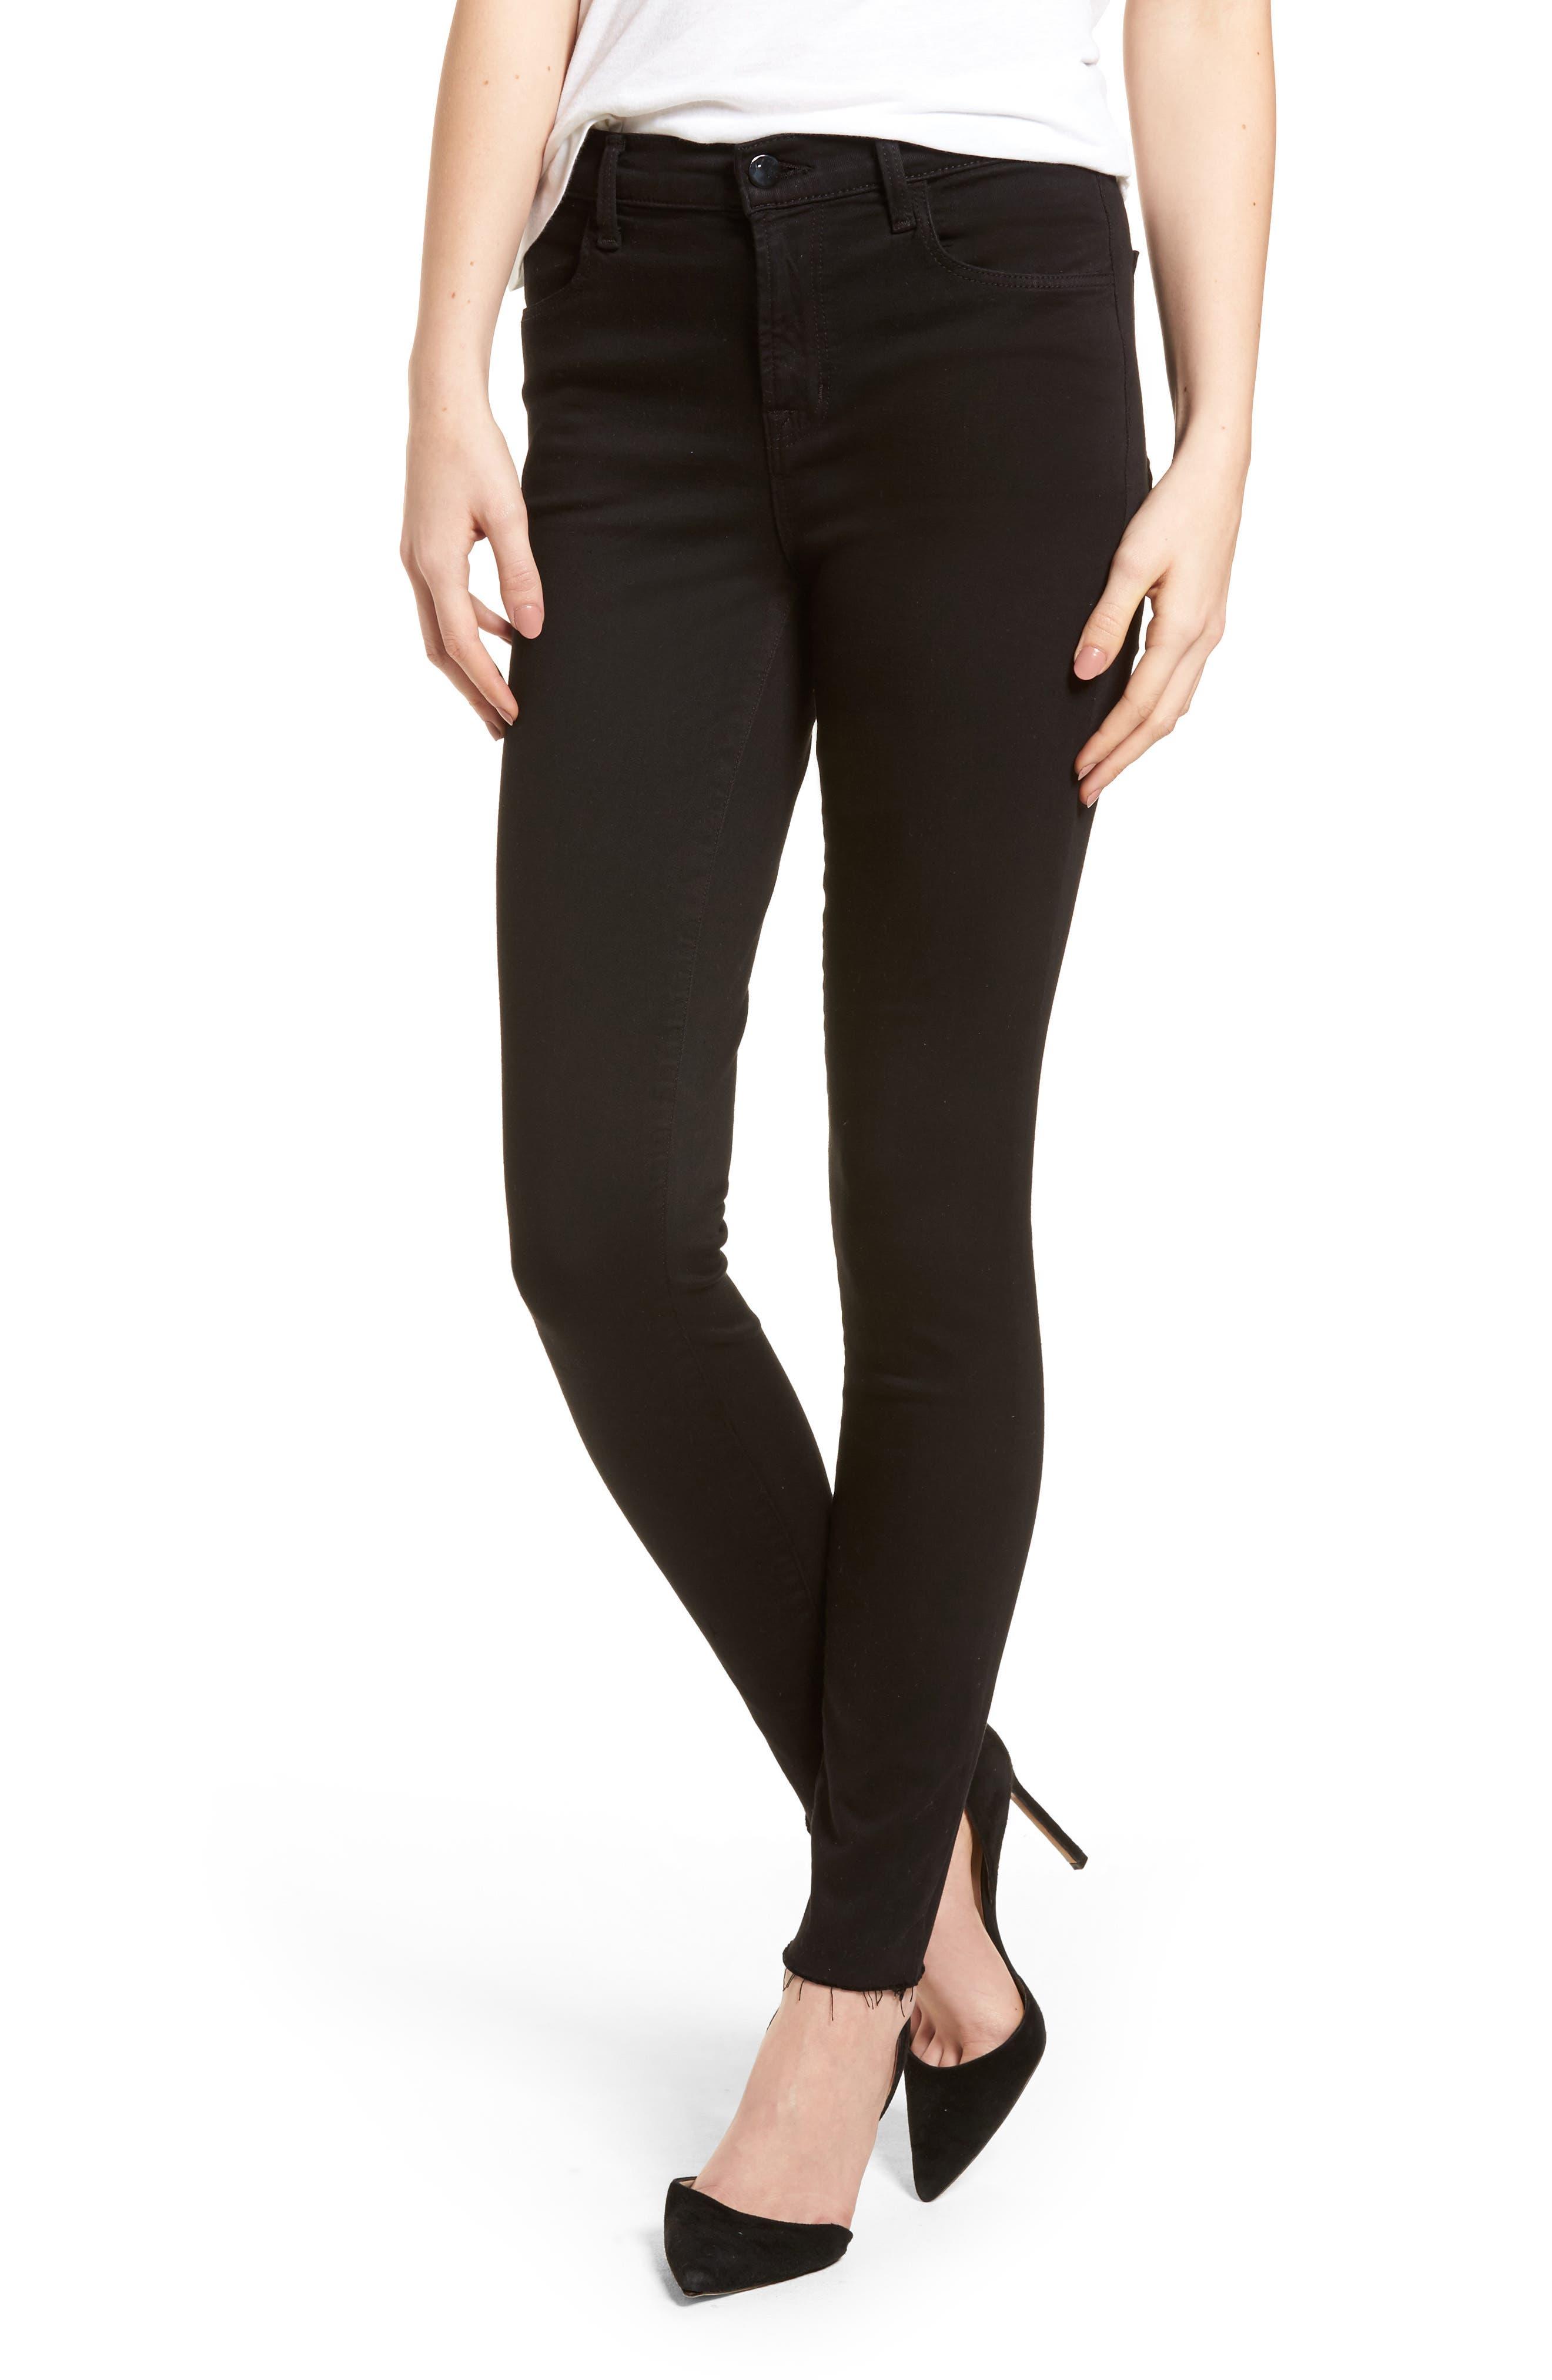 J Brand Maria High Waist Skinny Jeans (Black Bastille) (Nordstrom Exclusive)